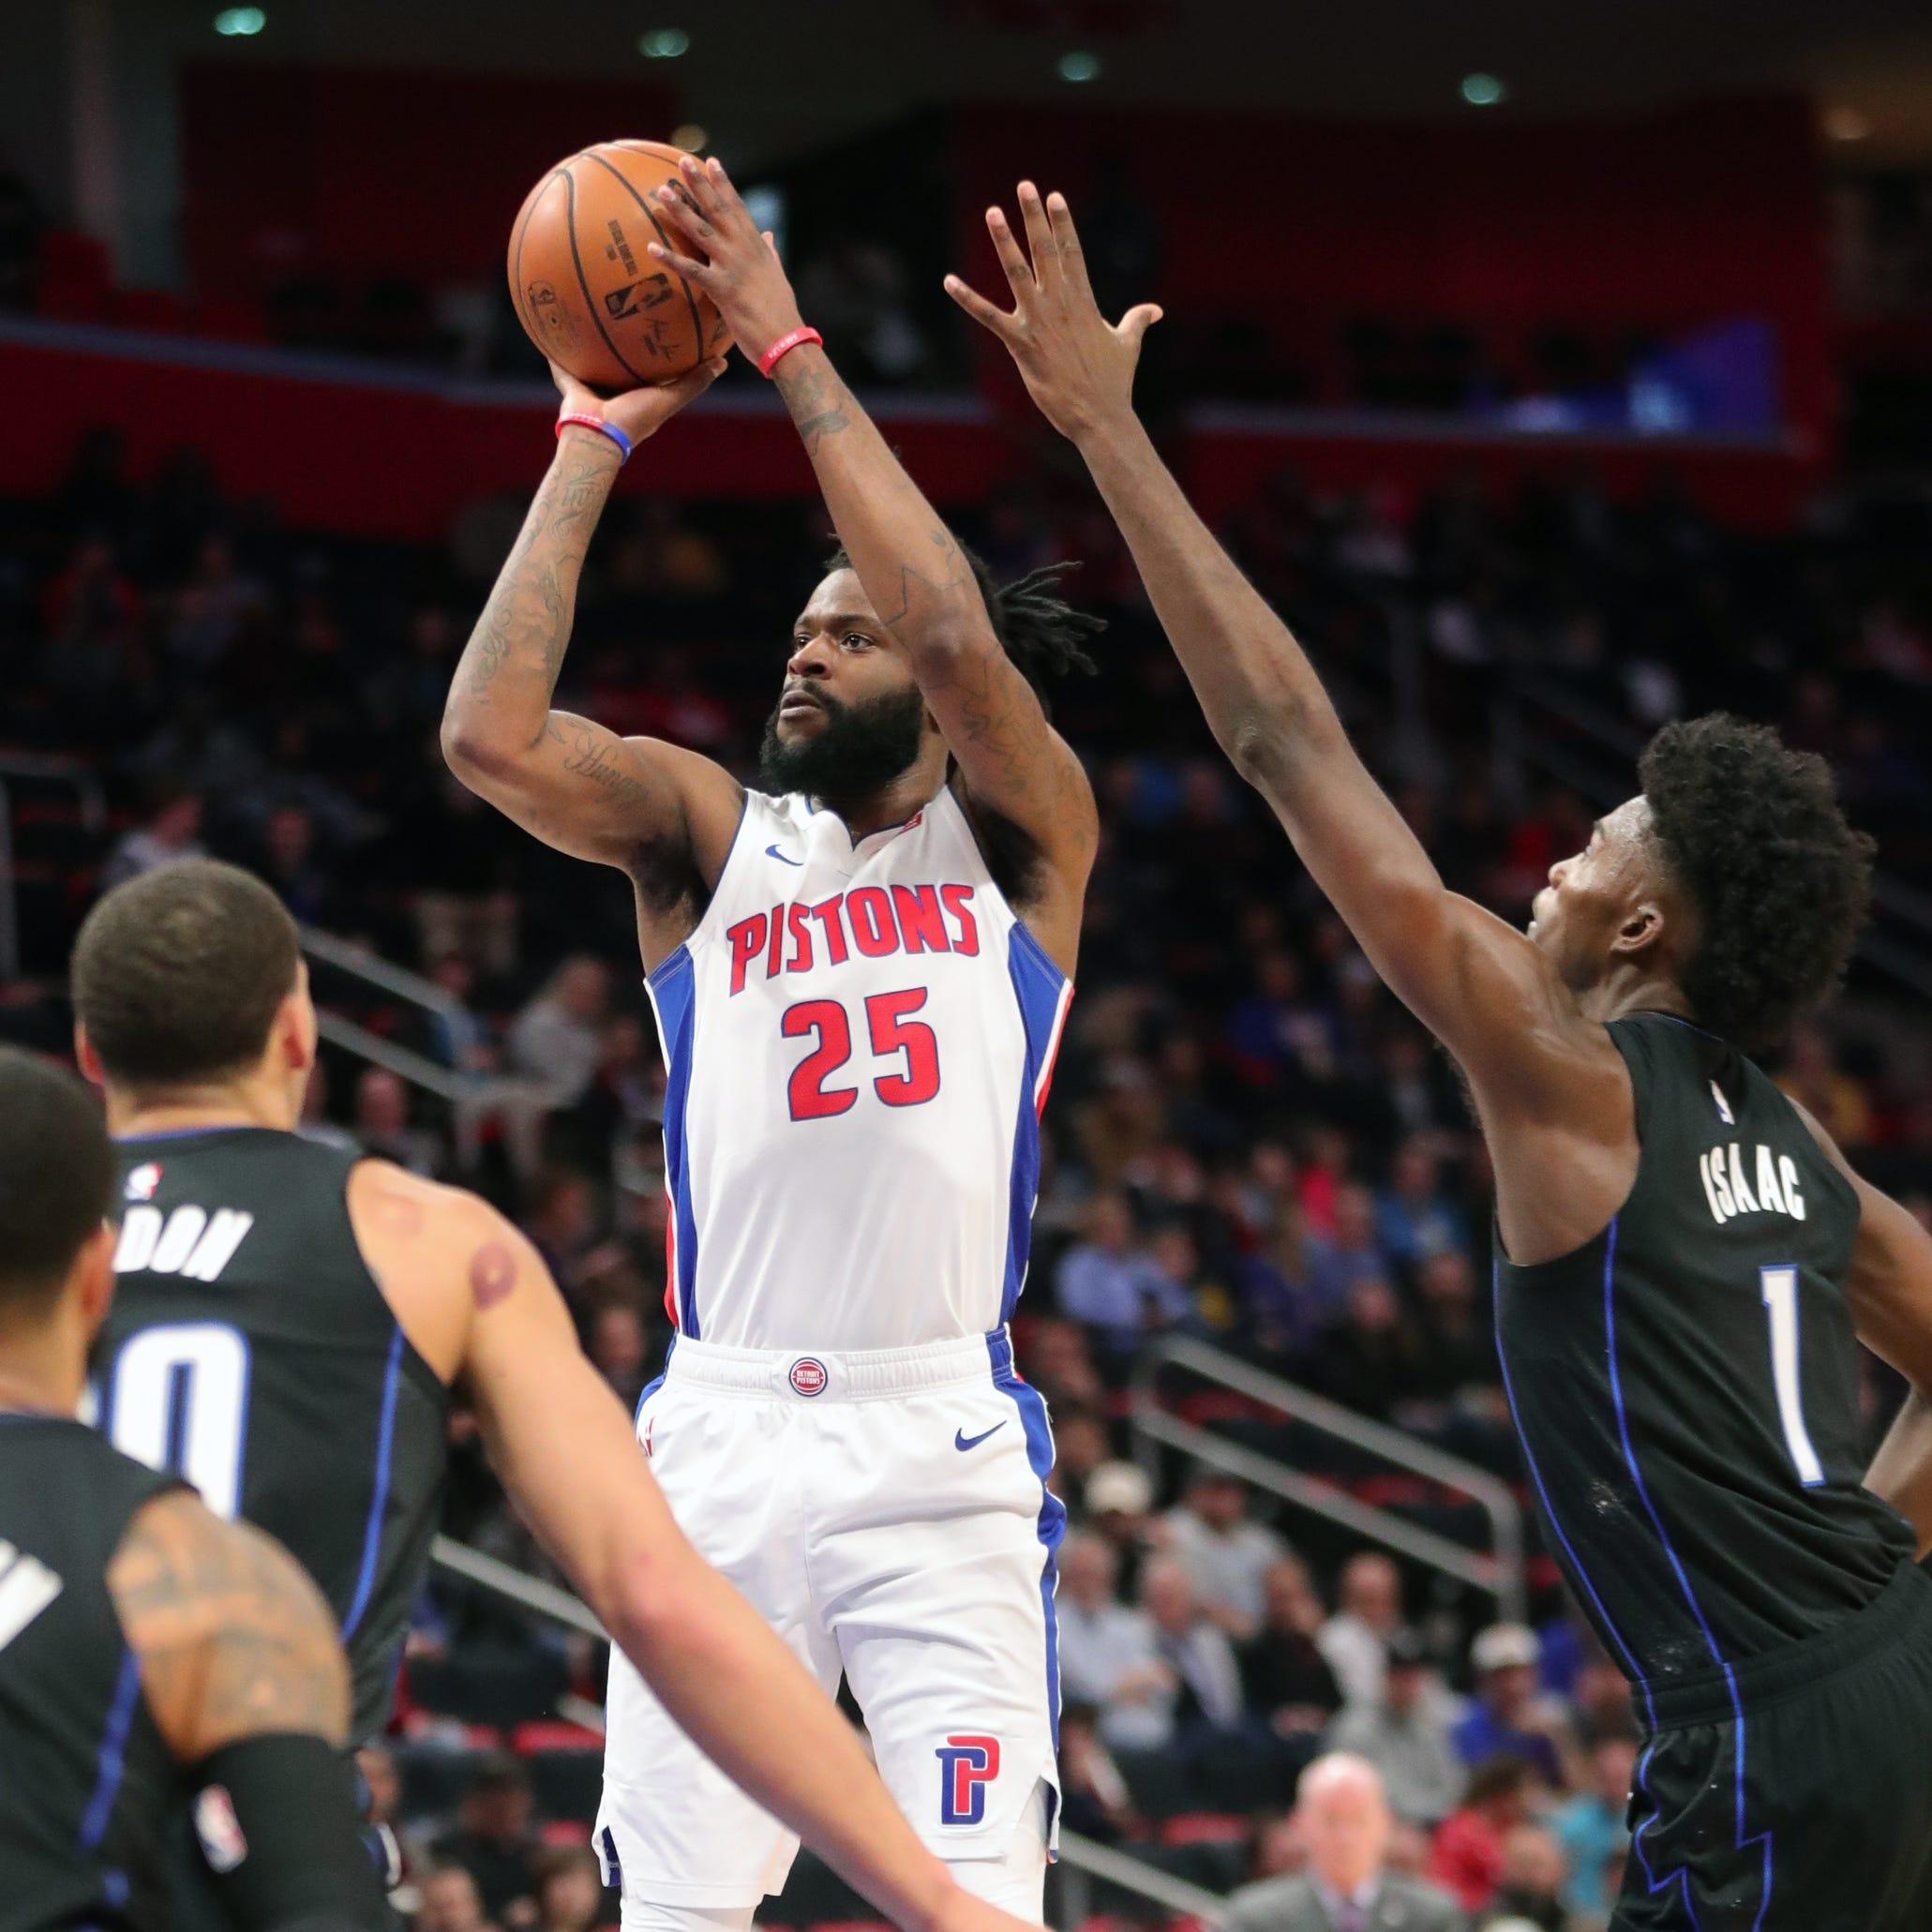 Detroit Pistons mailbag: Should Reggie Bullock trade be explored?